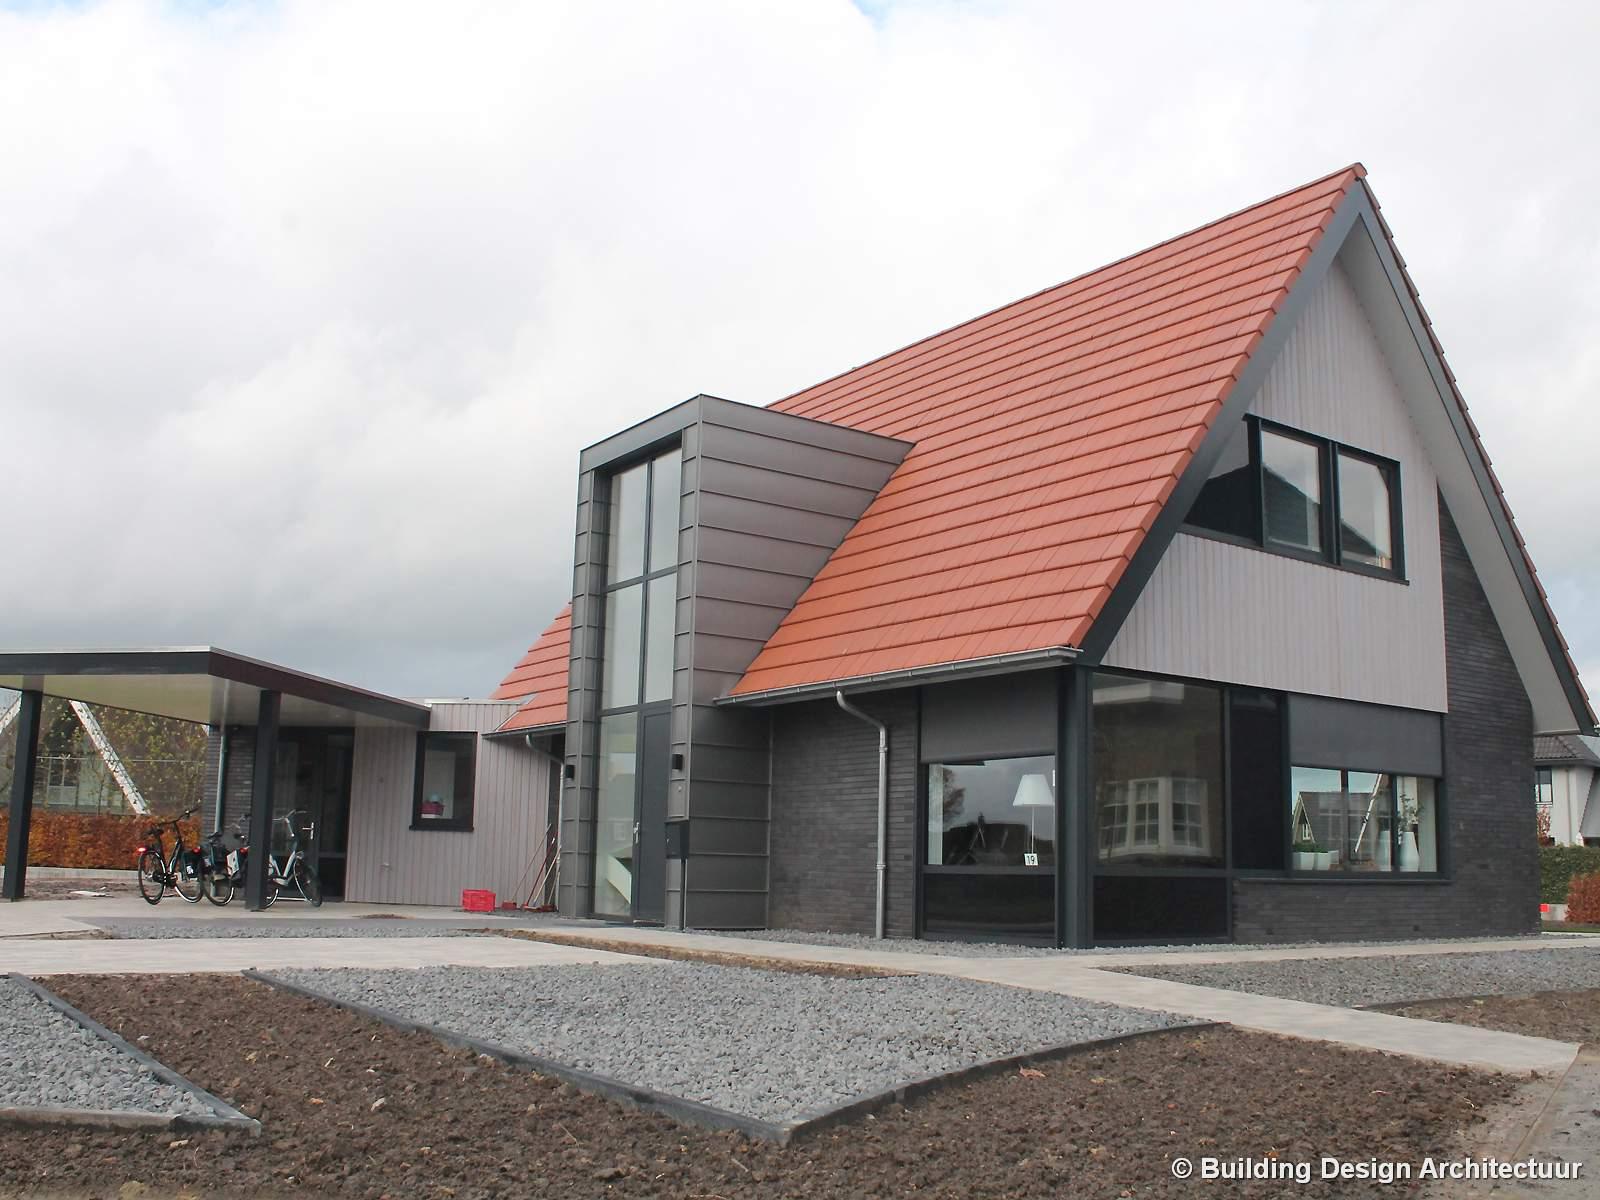 Building design architectuur - Fotos eigentijdse huizen ...